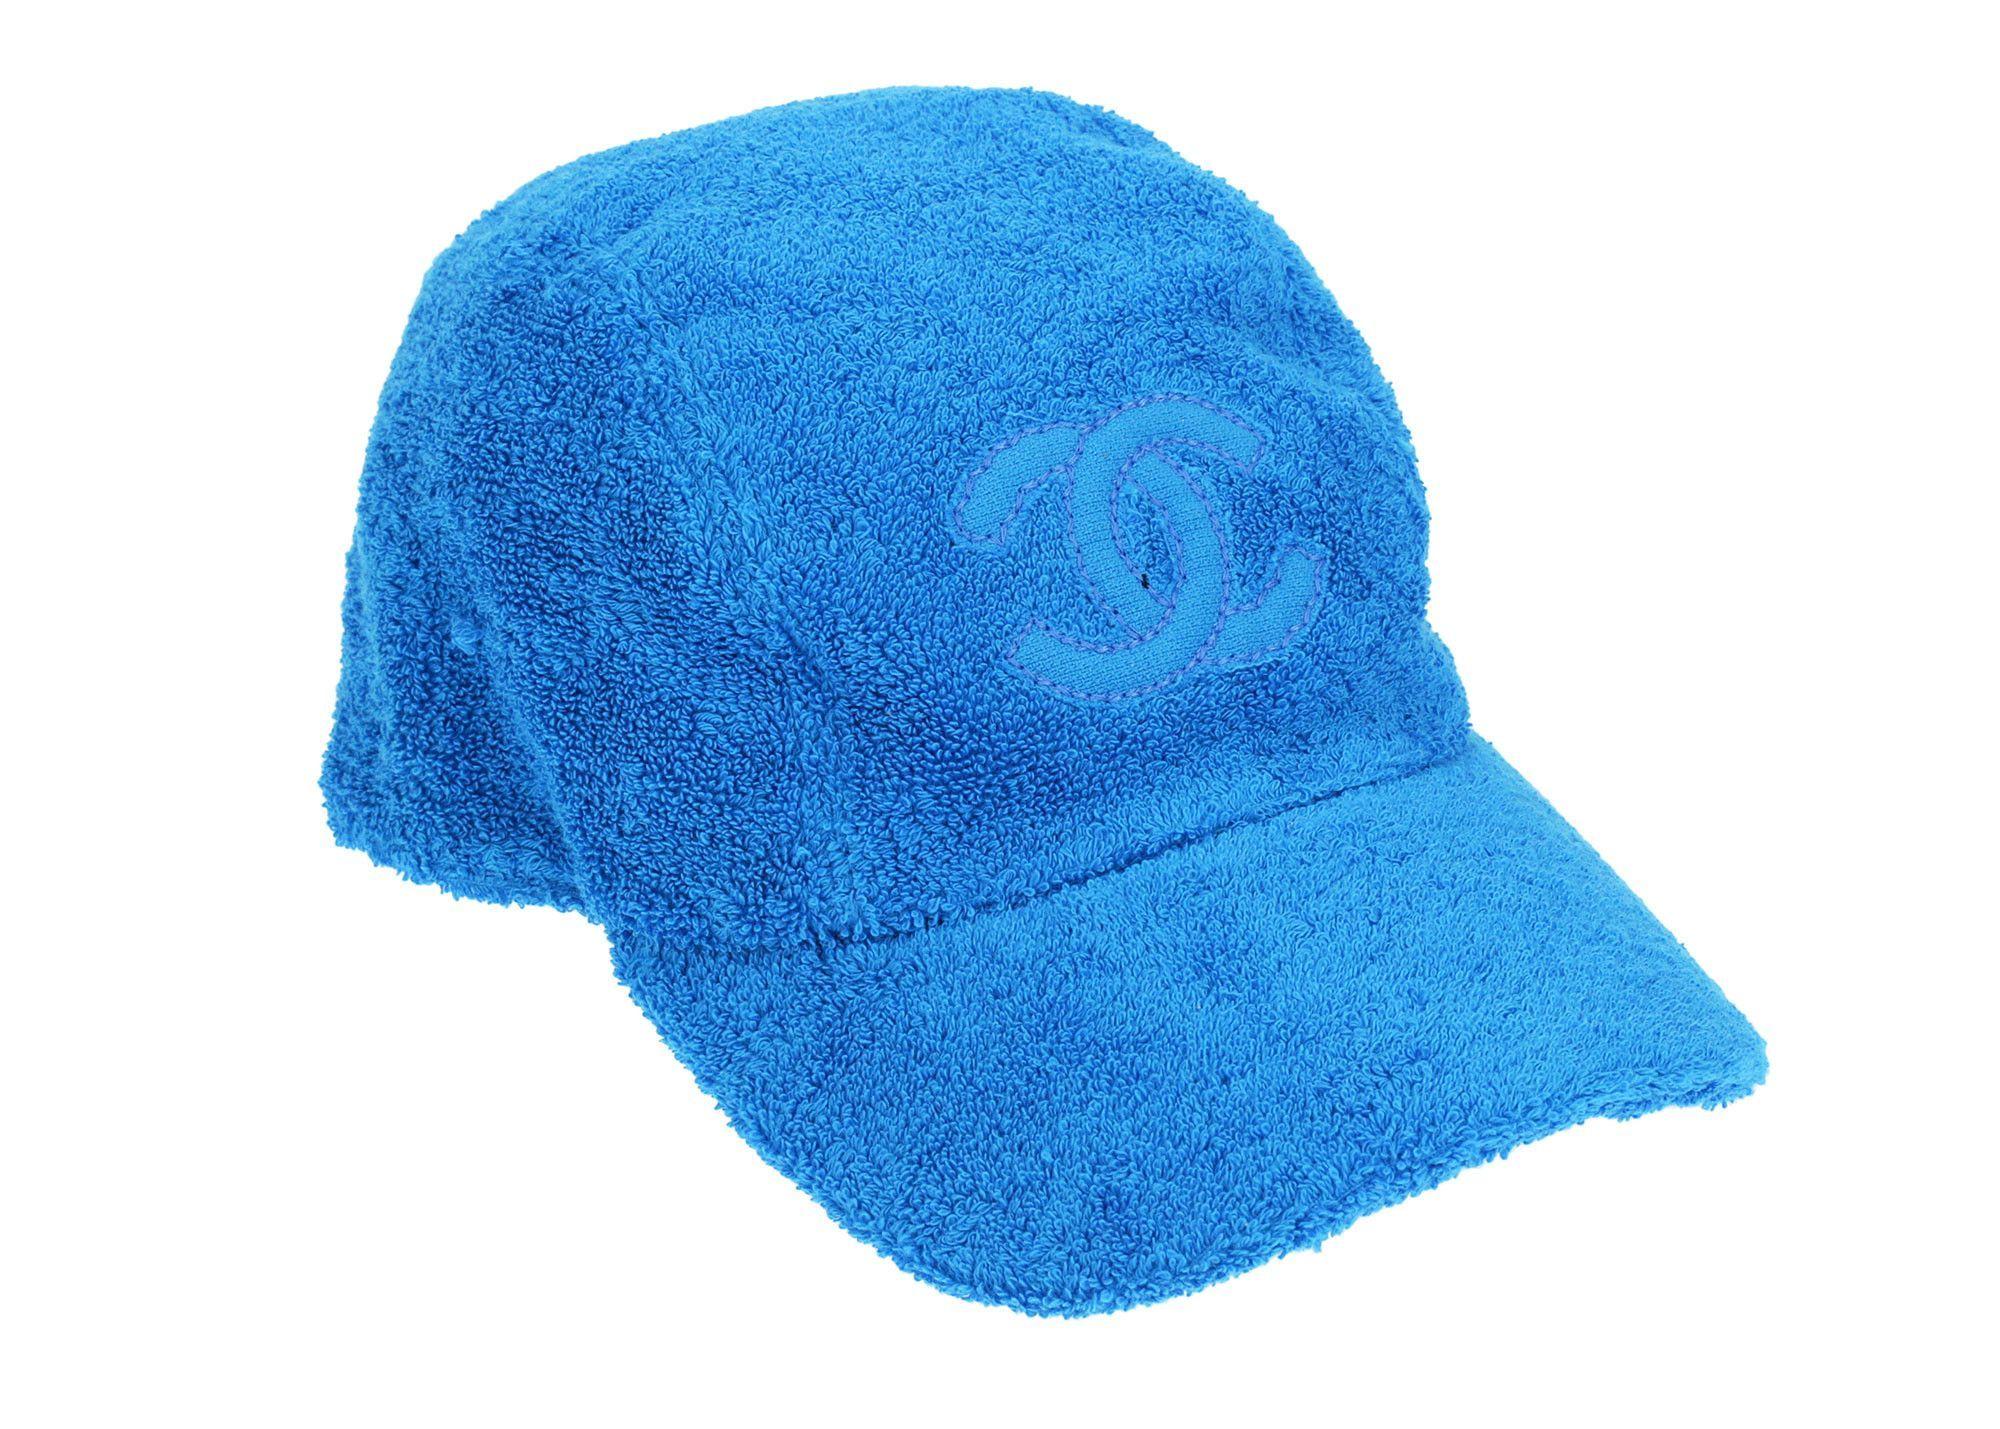 5ebc4f26e Chanel Blue Terry Cloth CC Baseball Cap | Chanel | Chanel hat ...